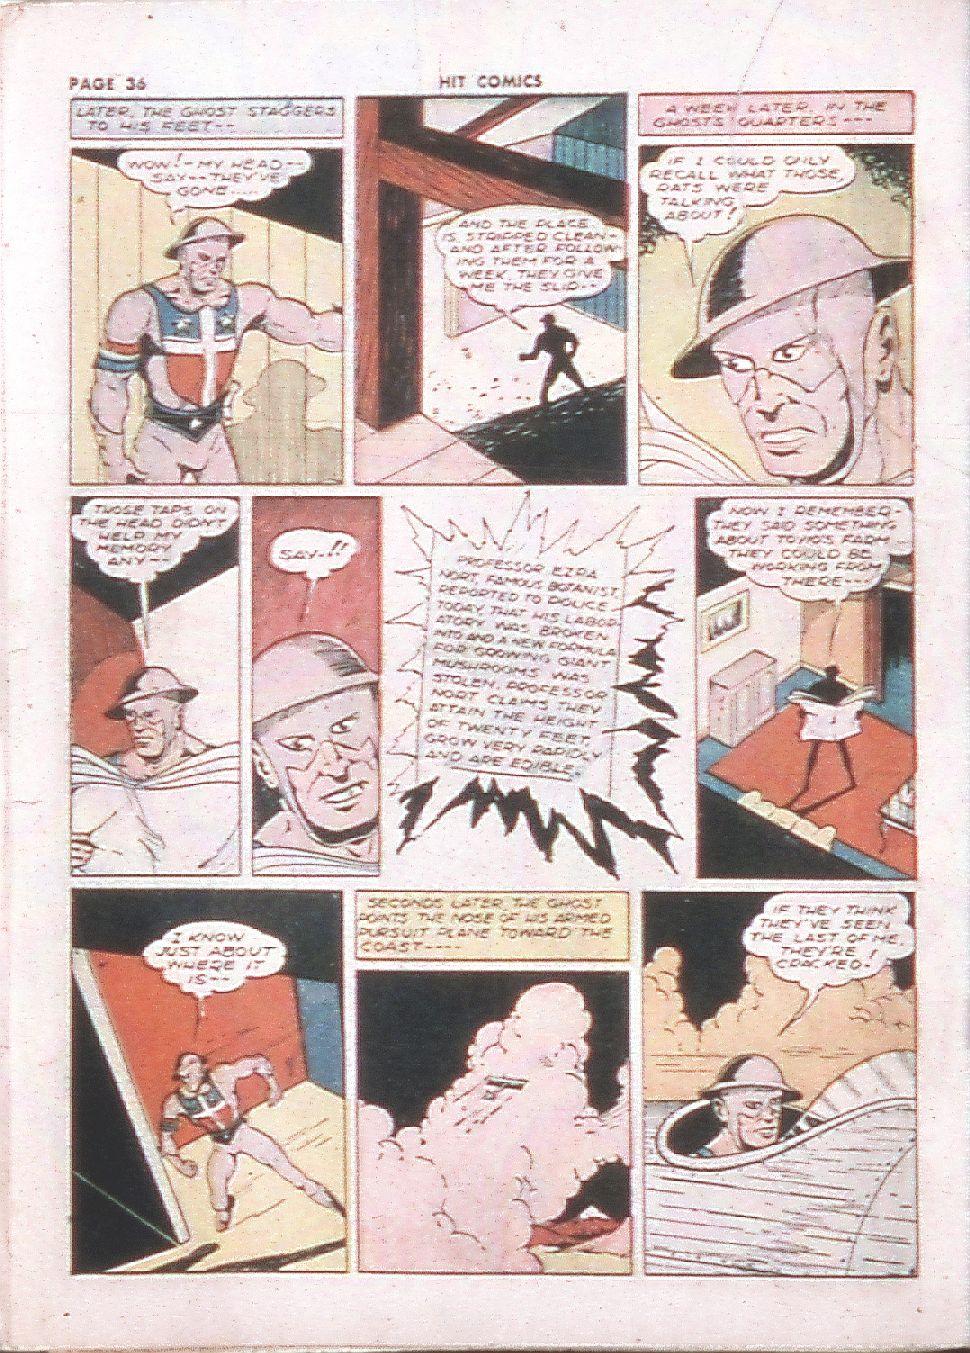 Read online Hit Comics comic -  Issue #24 - 38